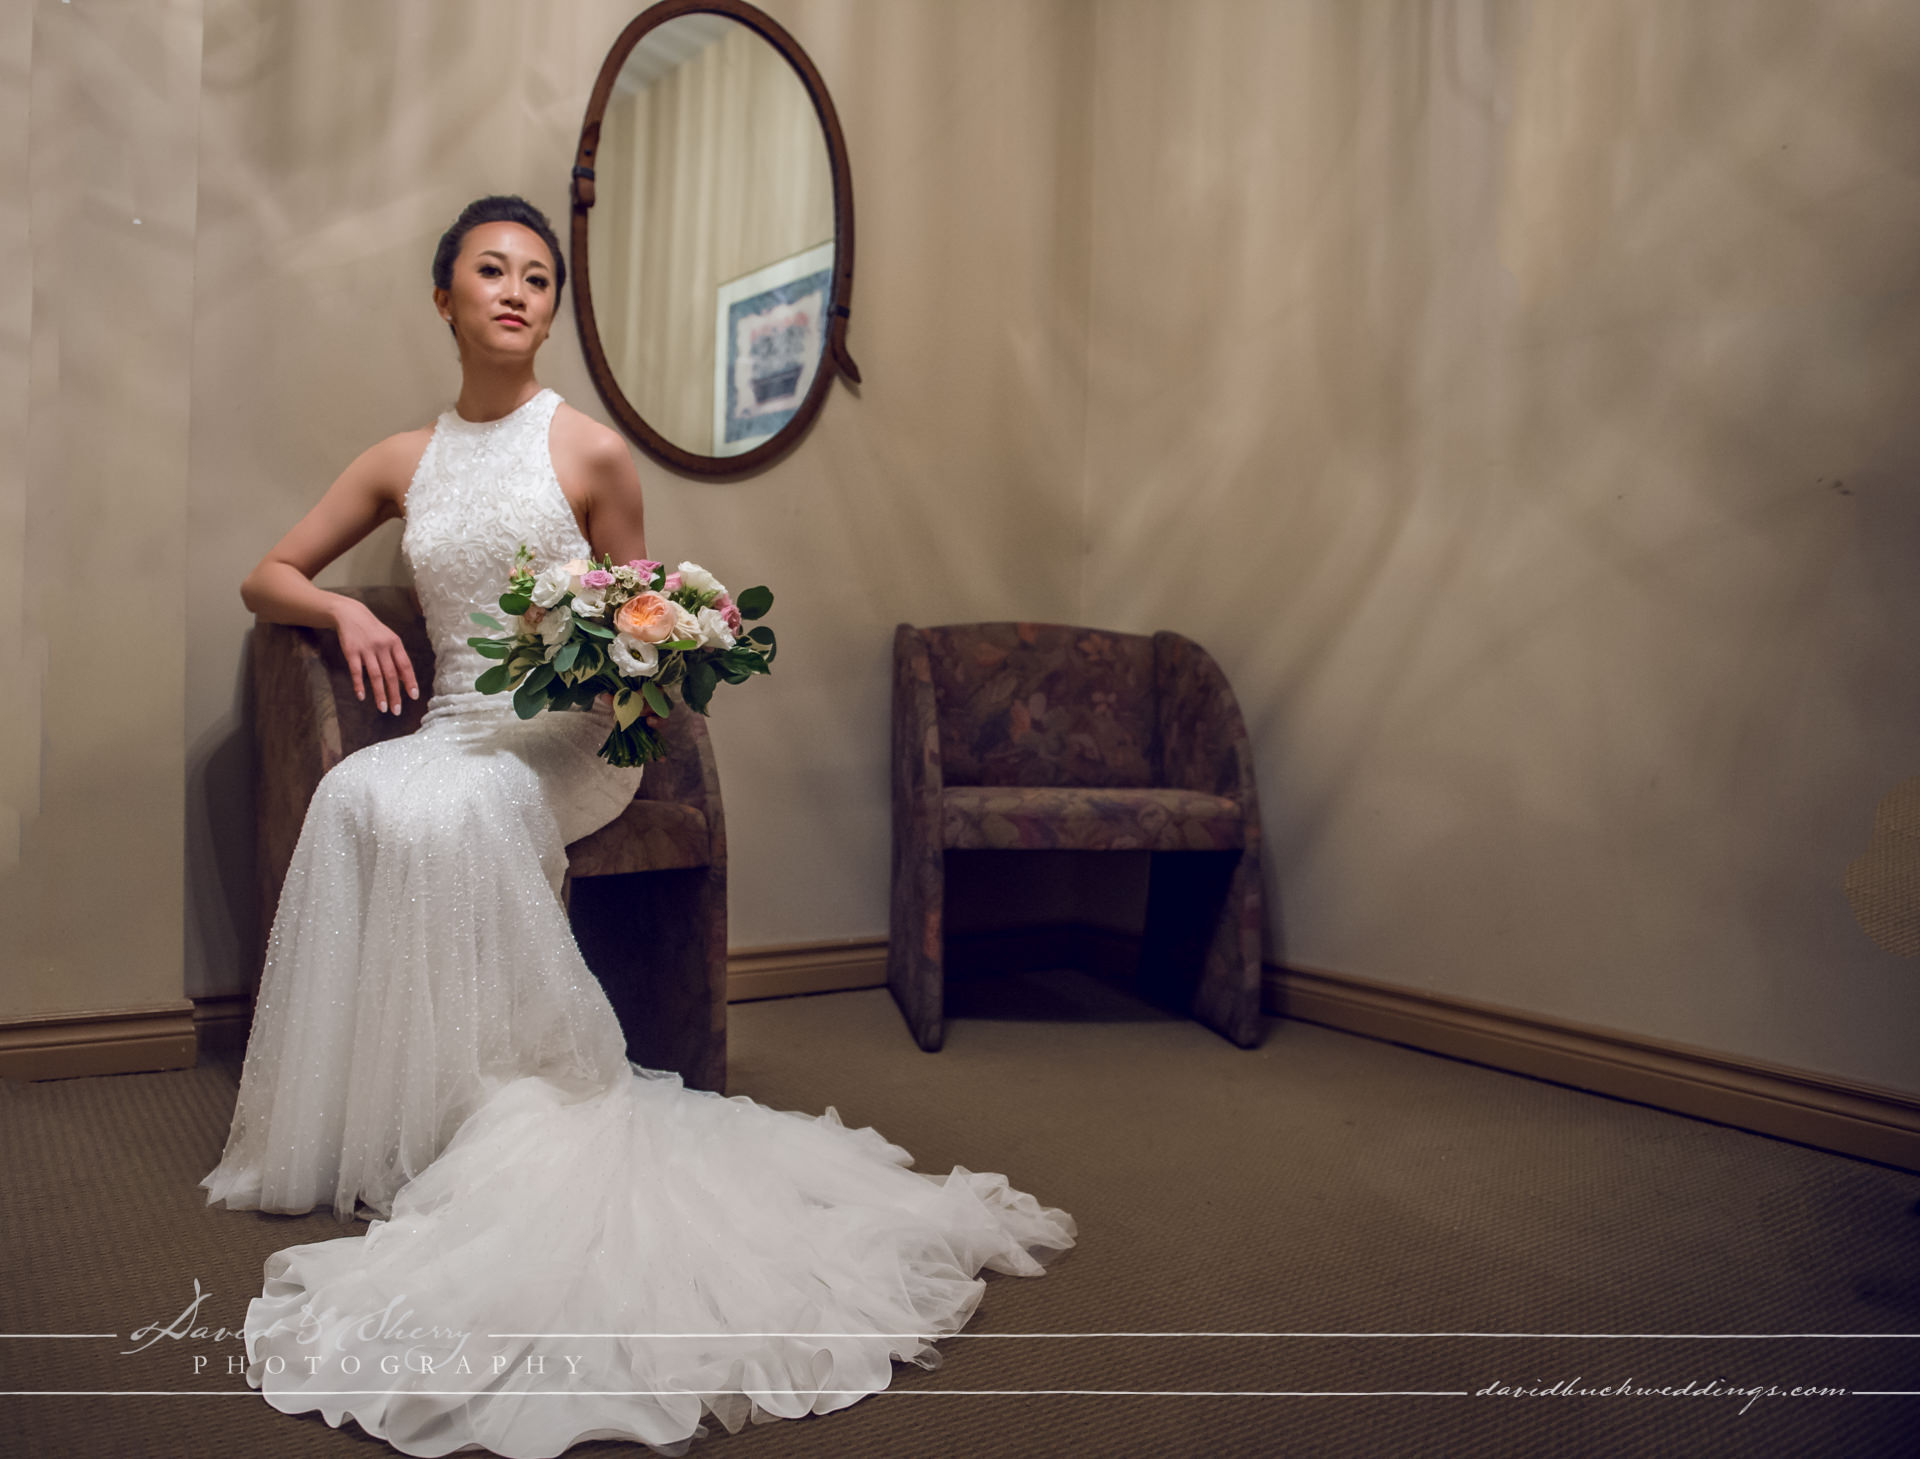 waterstone-estate-wedding-david-sherry-photography-simon-crystal-004